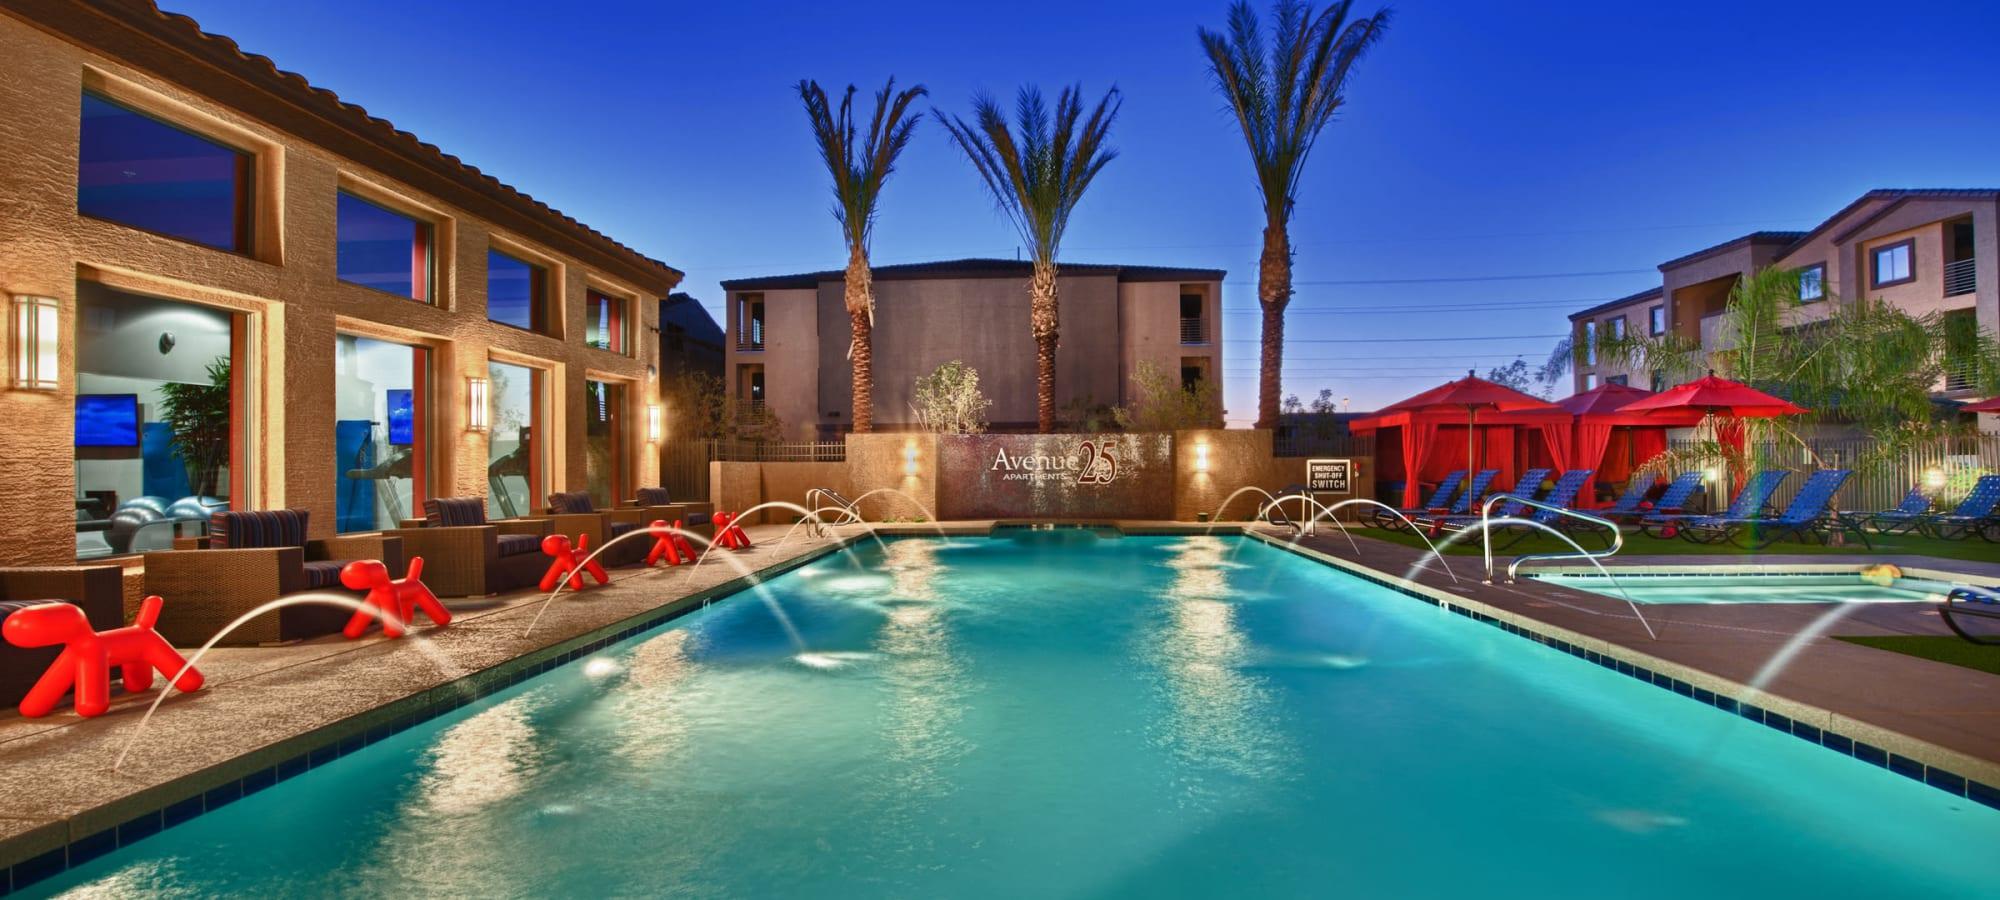 Large swimming pool at Avenue 25 Apartments in Phoenix, Arizona